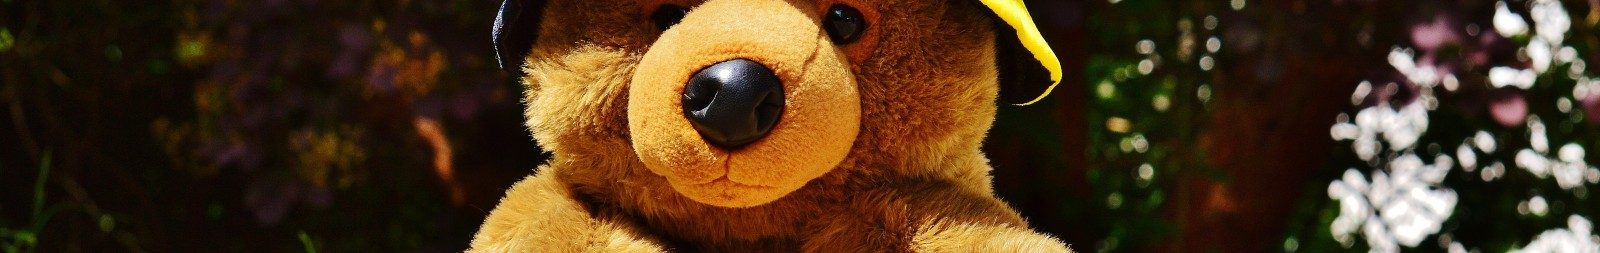 sport-play-sweet-cute-france-bear-611418-pxhere.com.jpg